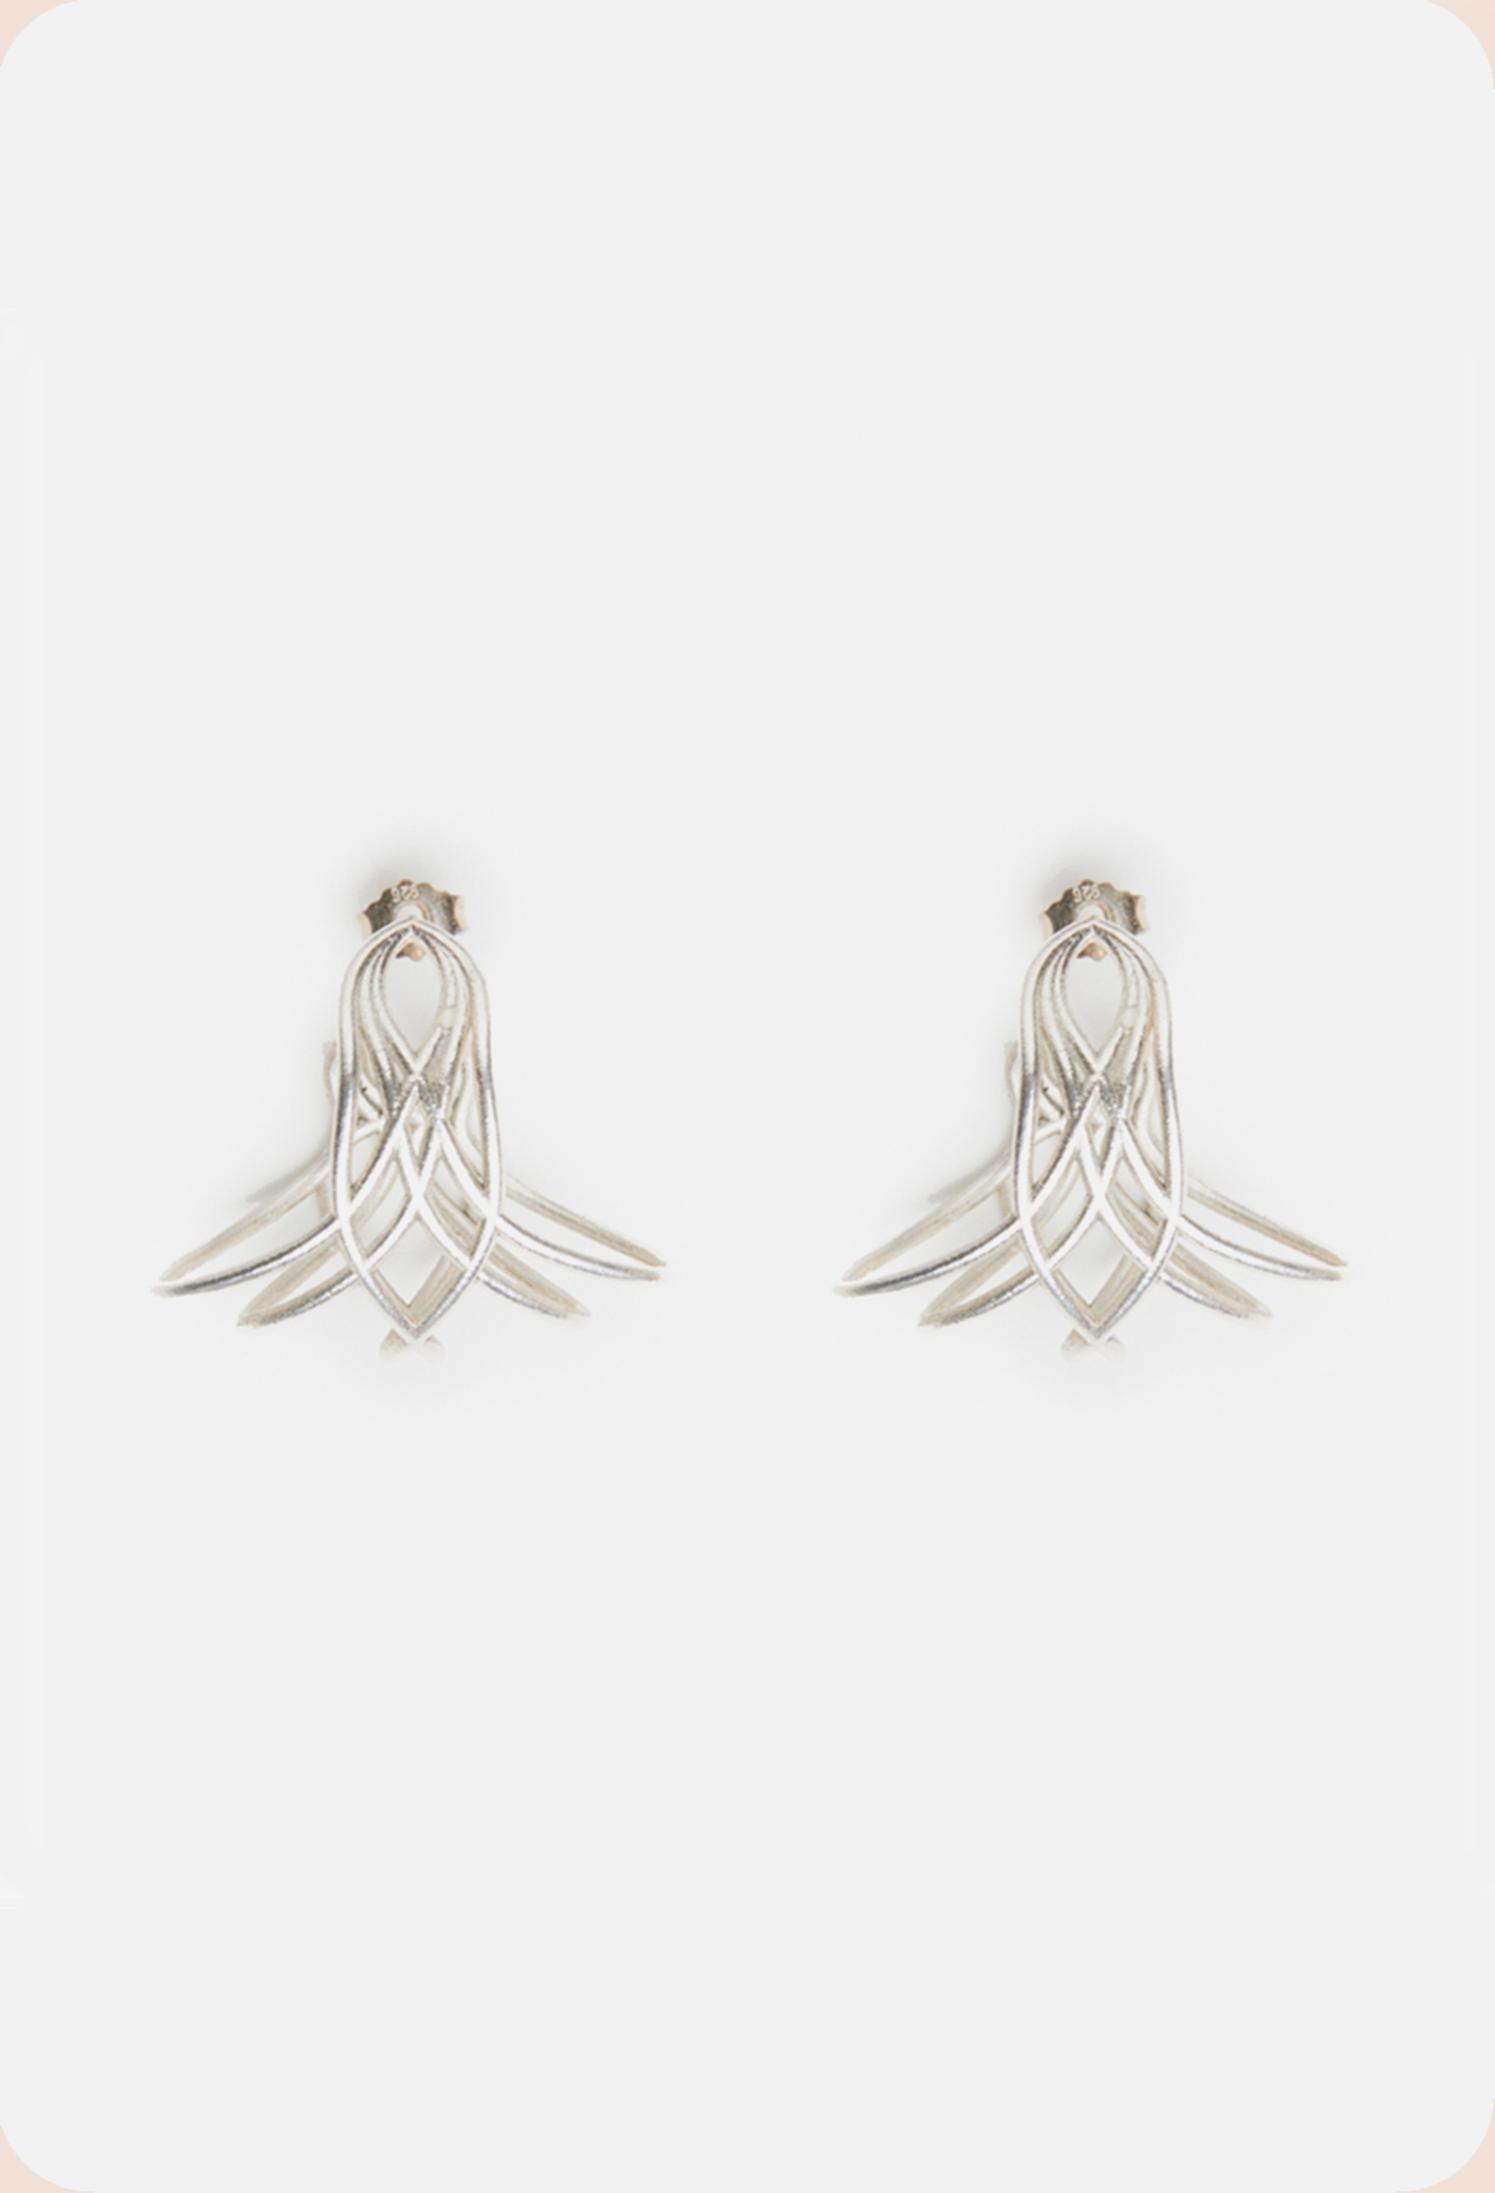 Ohrringe bienenkönigin sterling silber (2)